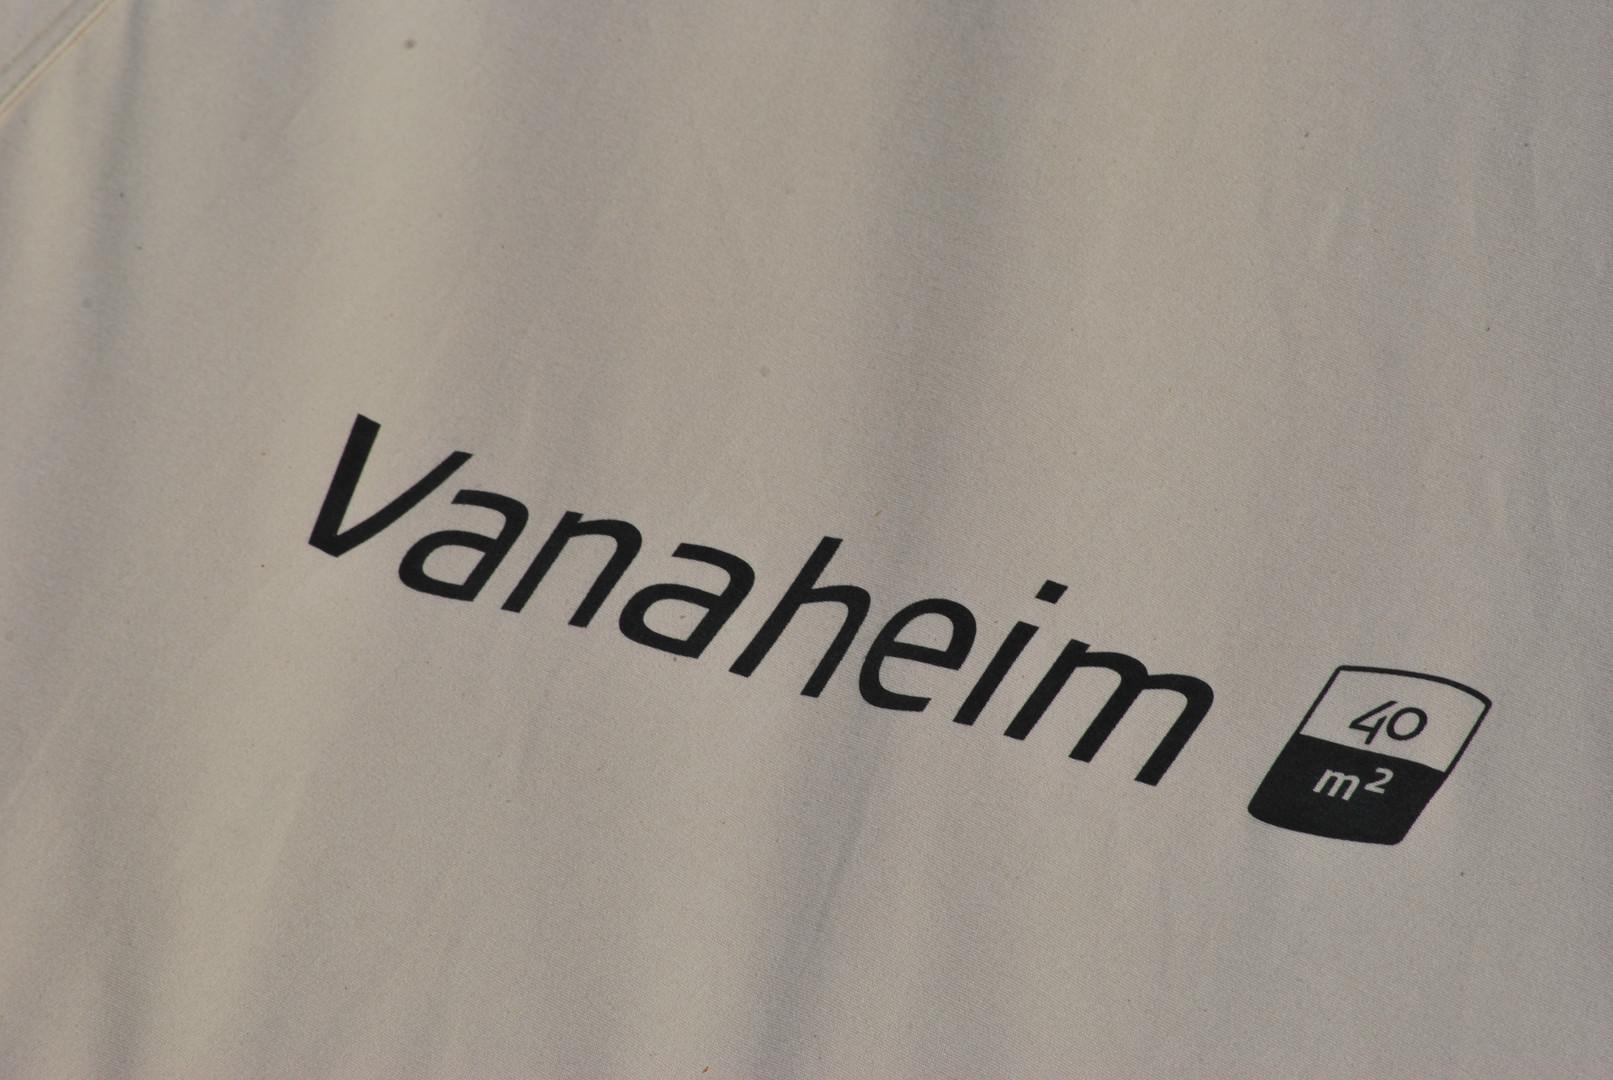 vanaheim-40-m2-142020-nordisk-classic-re